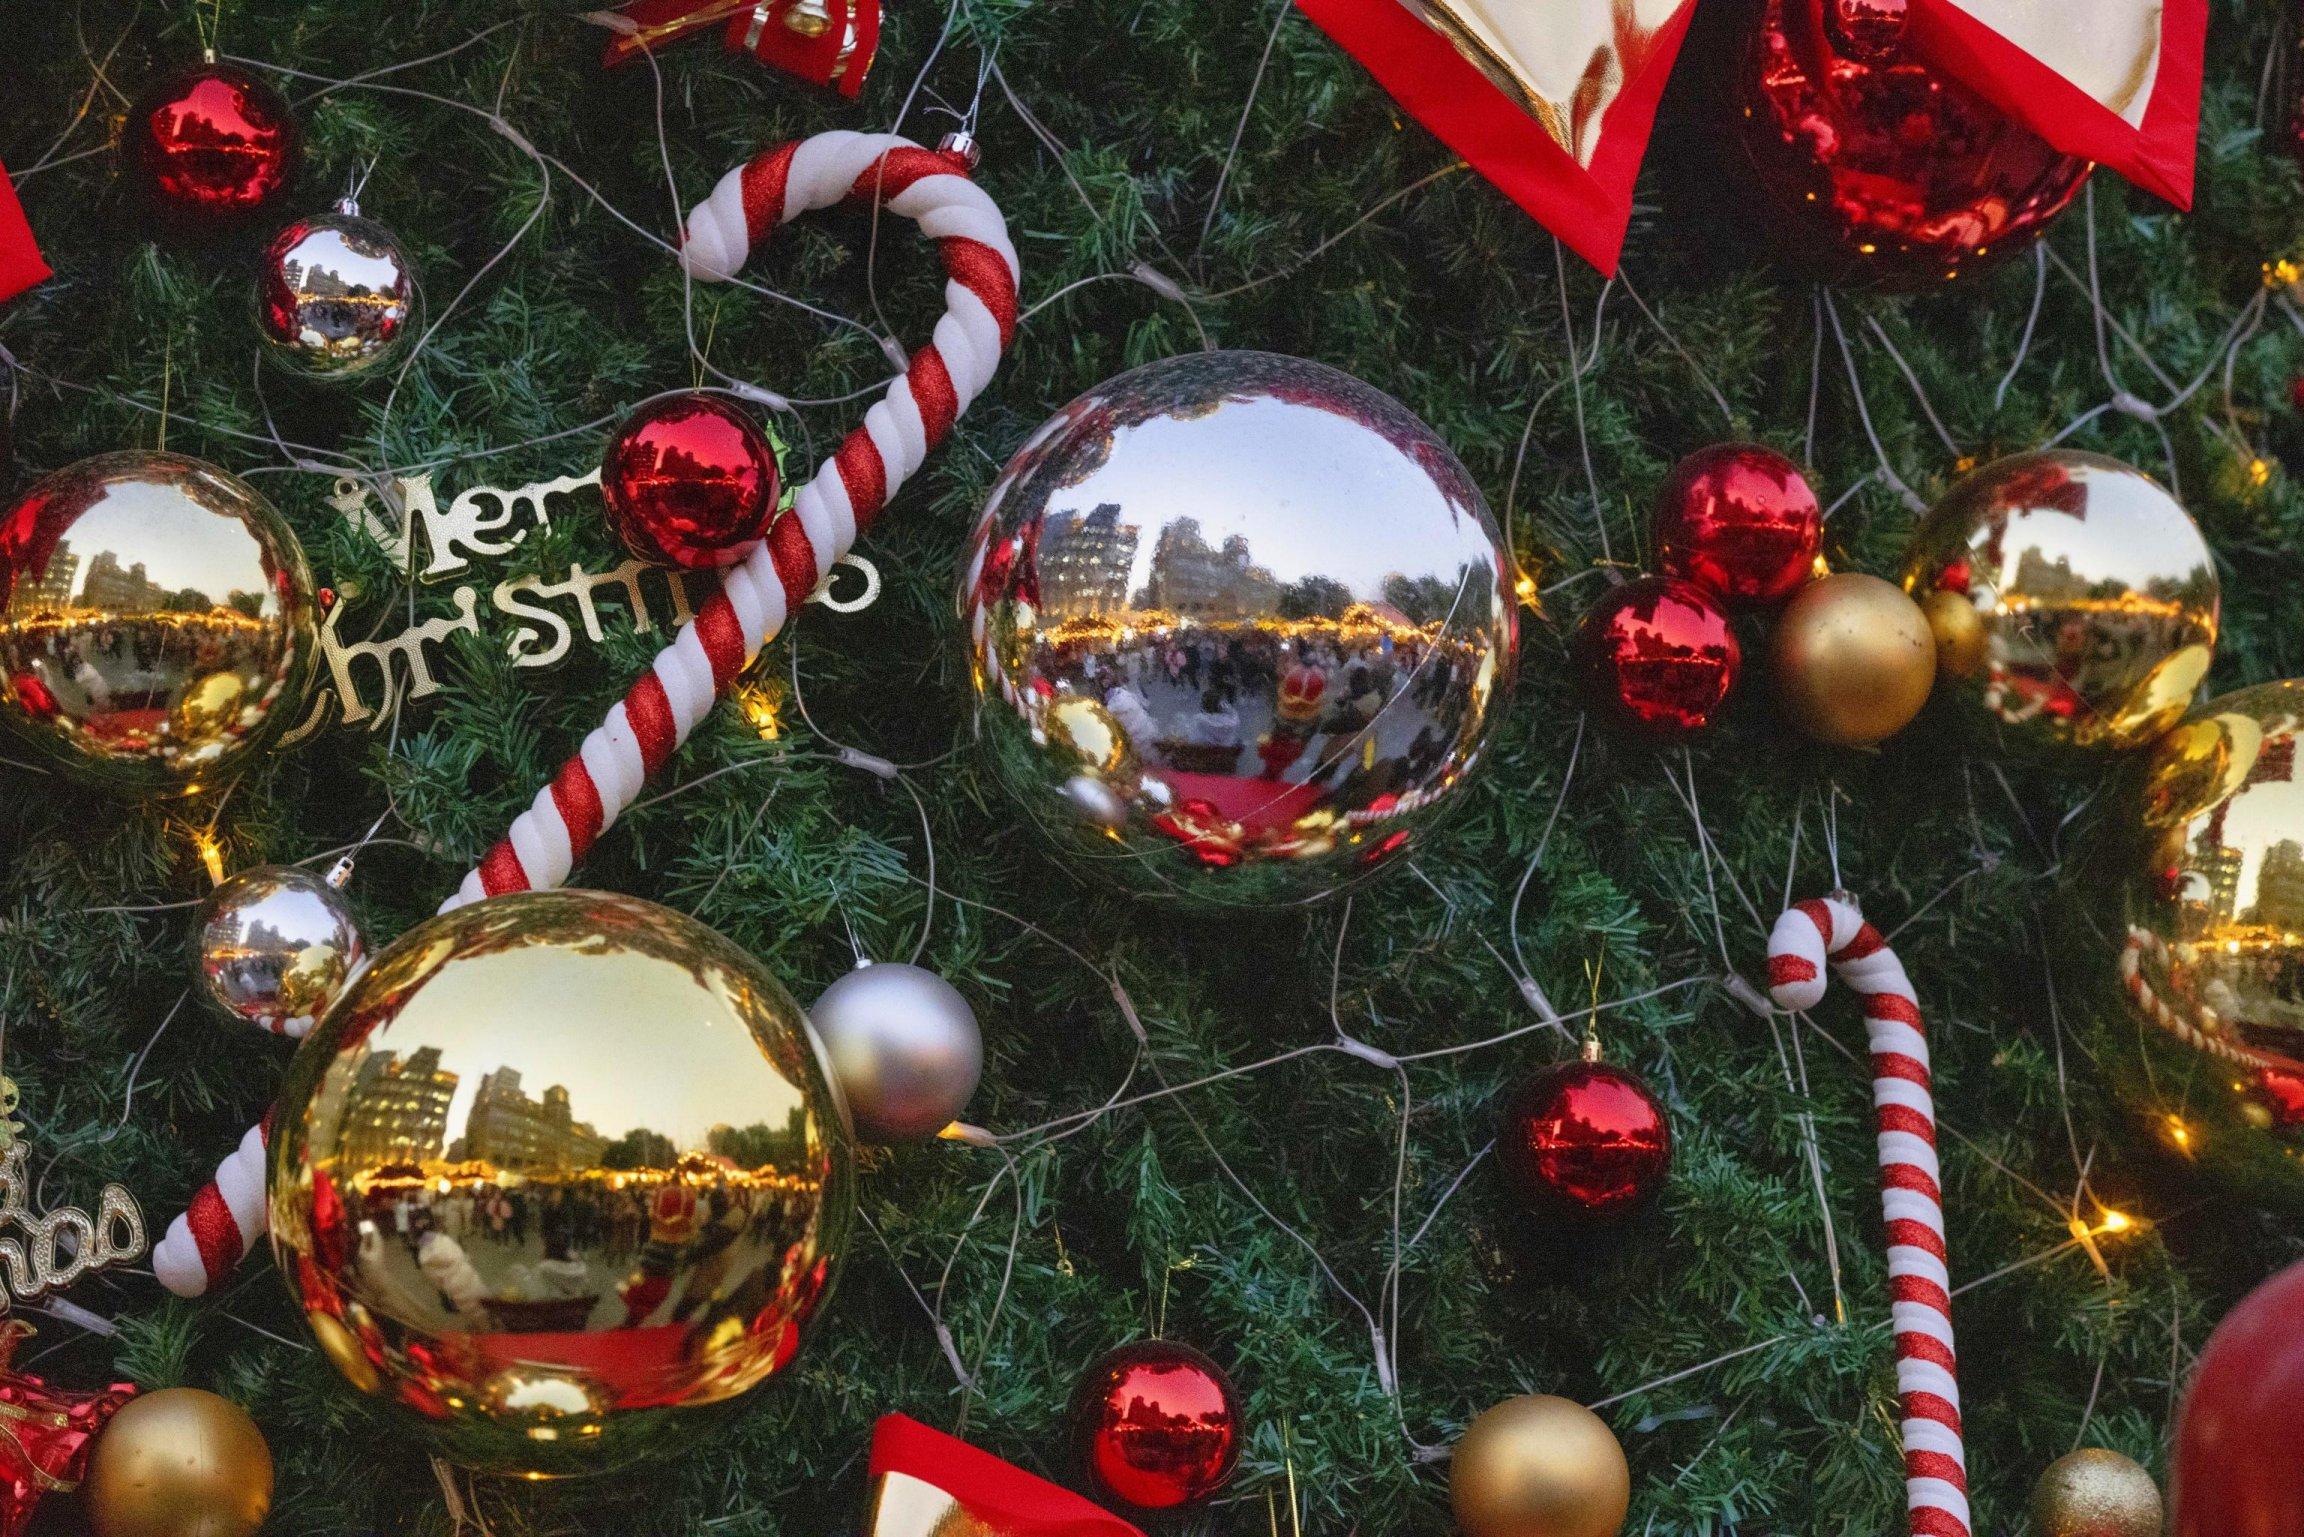 Auguri! Buon Natale 2020 da Digital-News.it e Digital-Forum.it